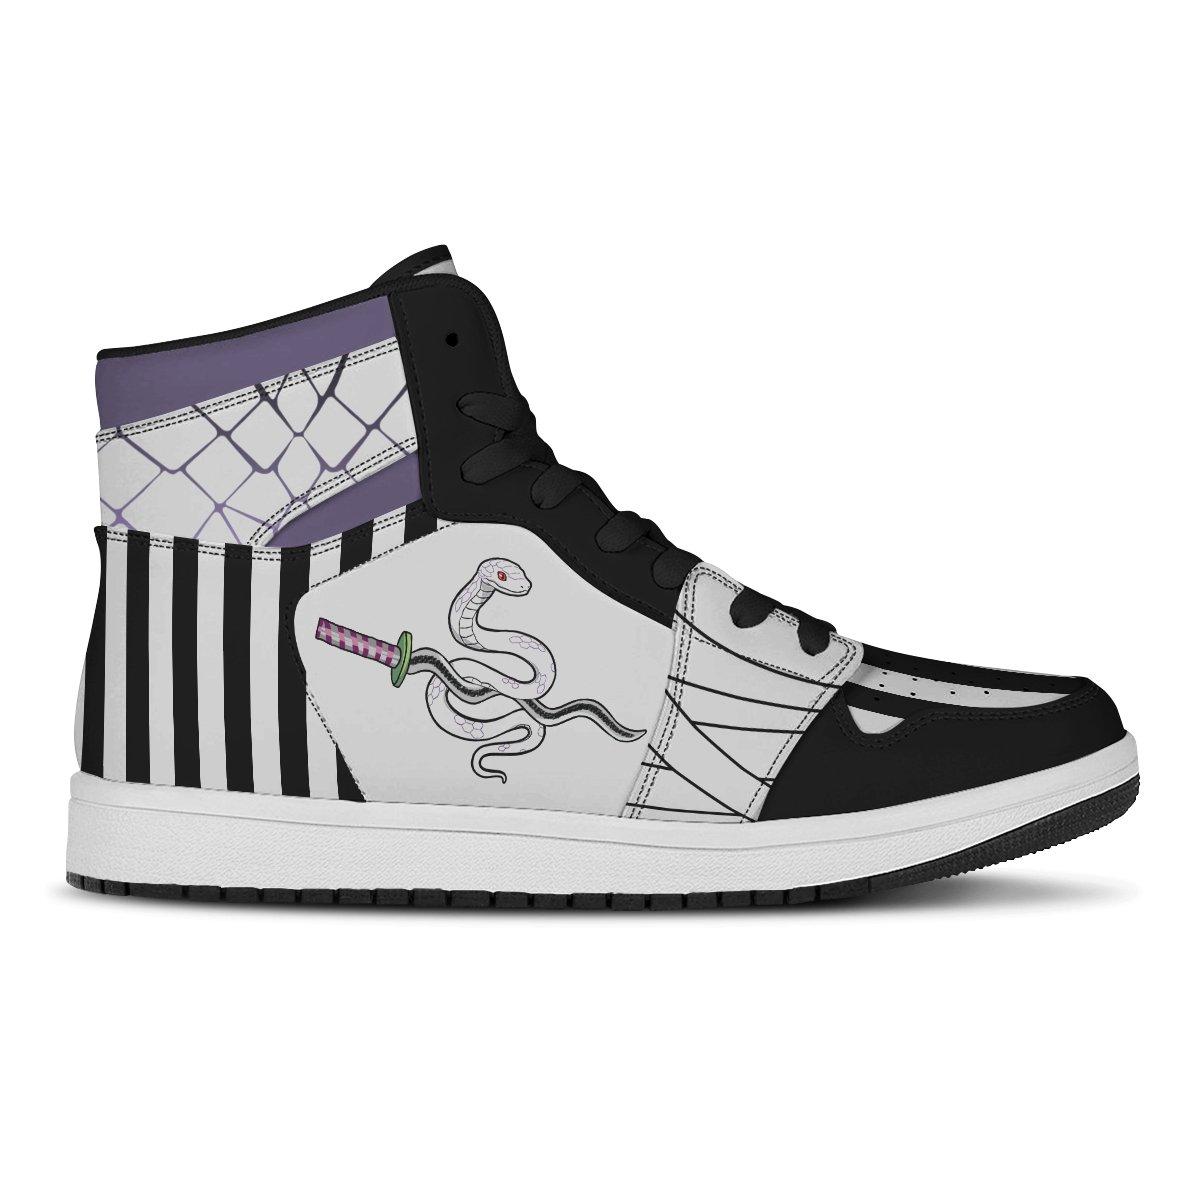 Obanai Serpen air jordan high top shoes1